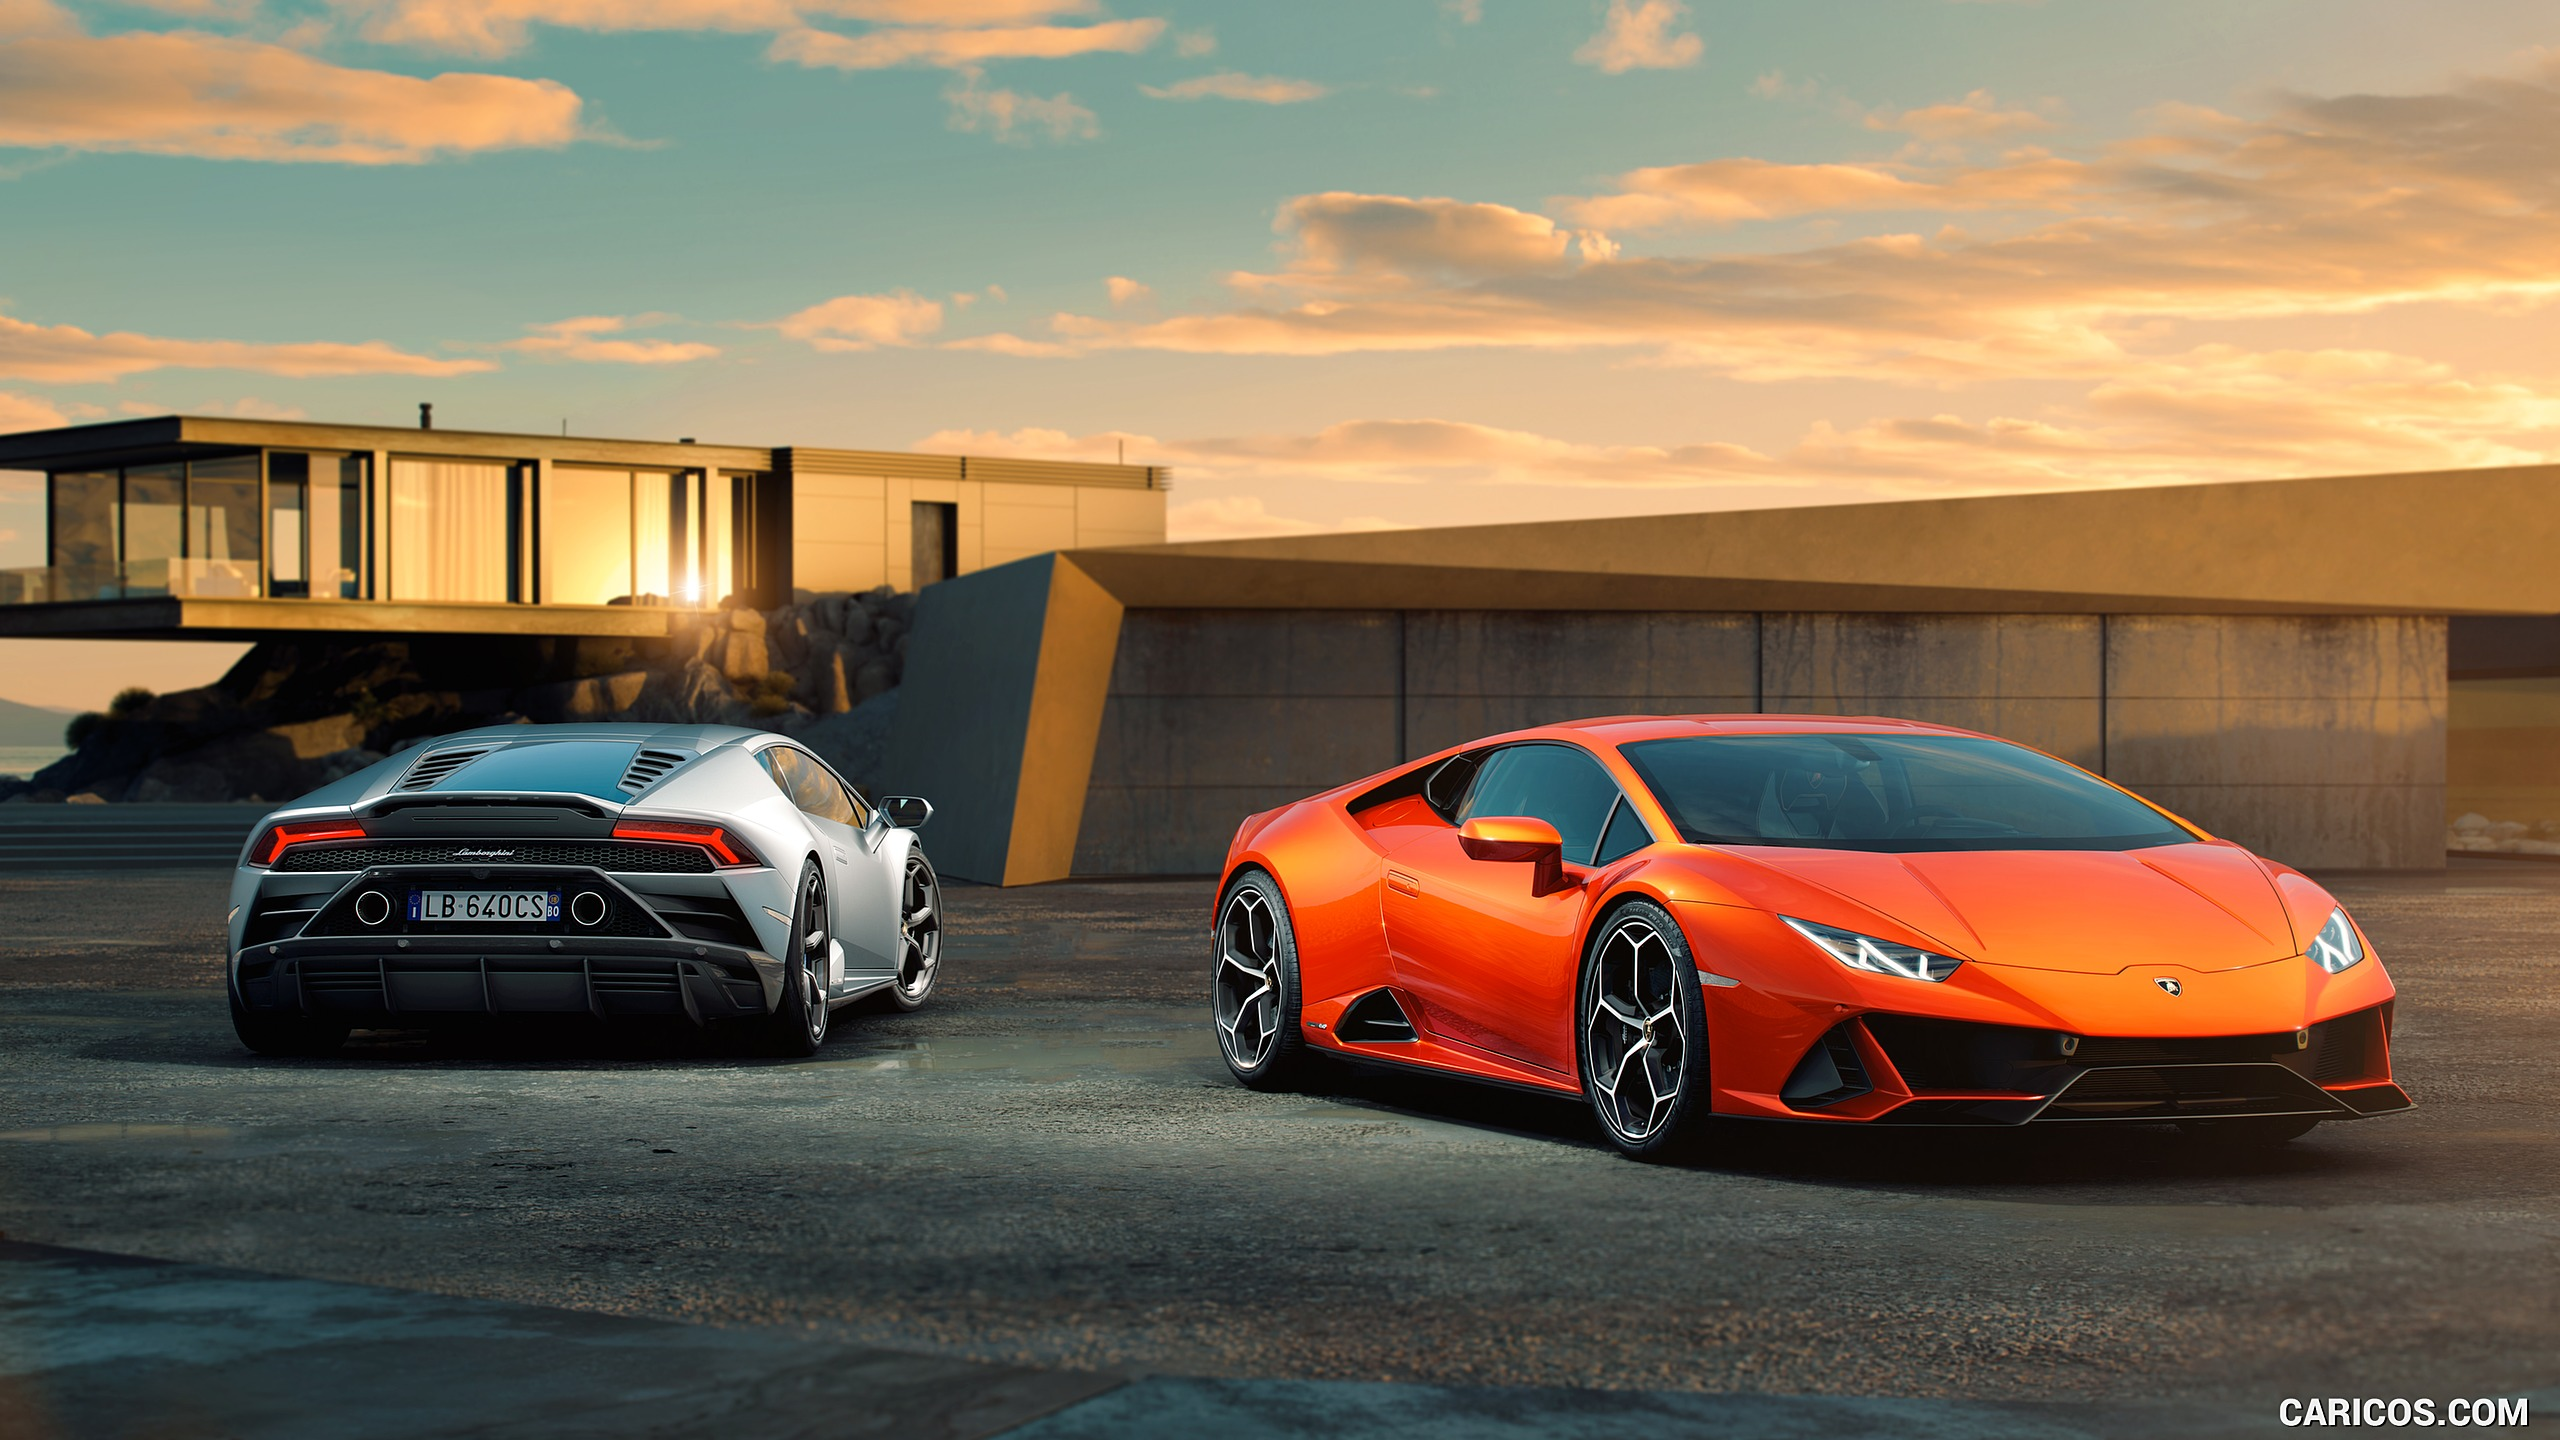 2019 Lamborghini Huracn EVO HD Wallpaper 3 2560x1440